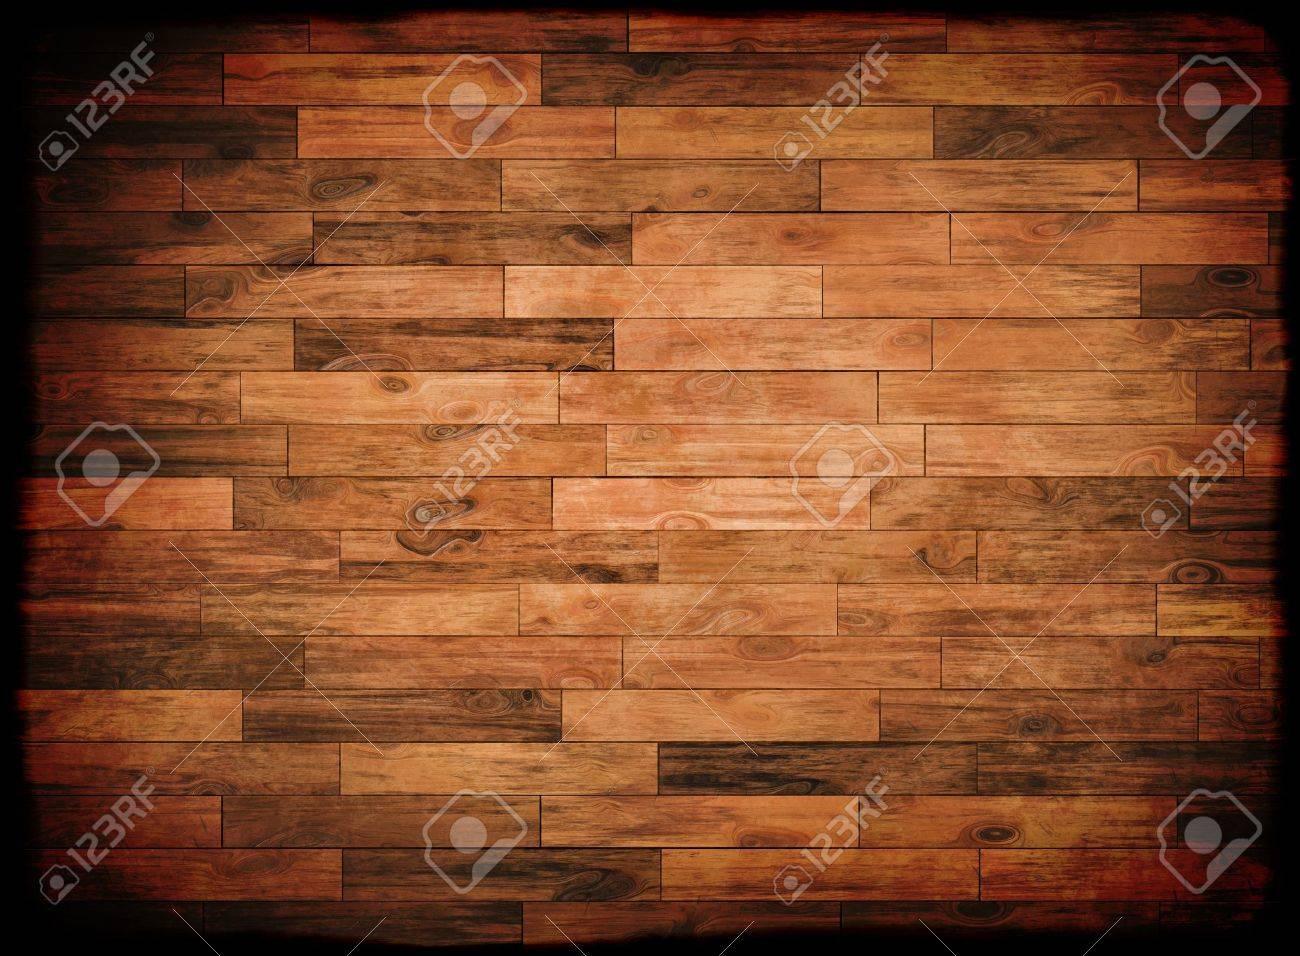 wood floor texture Stock Photo - 9473586